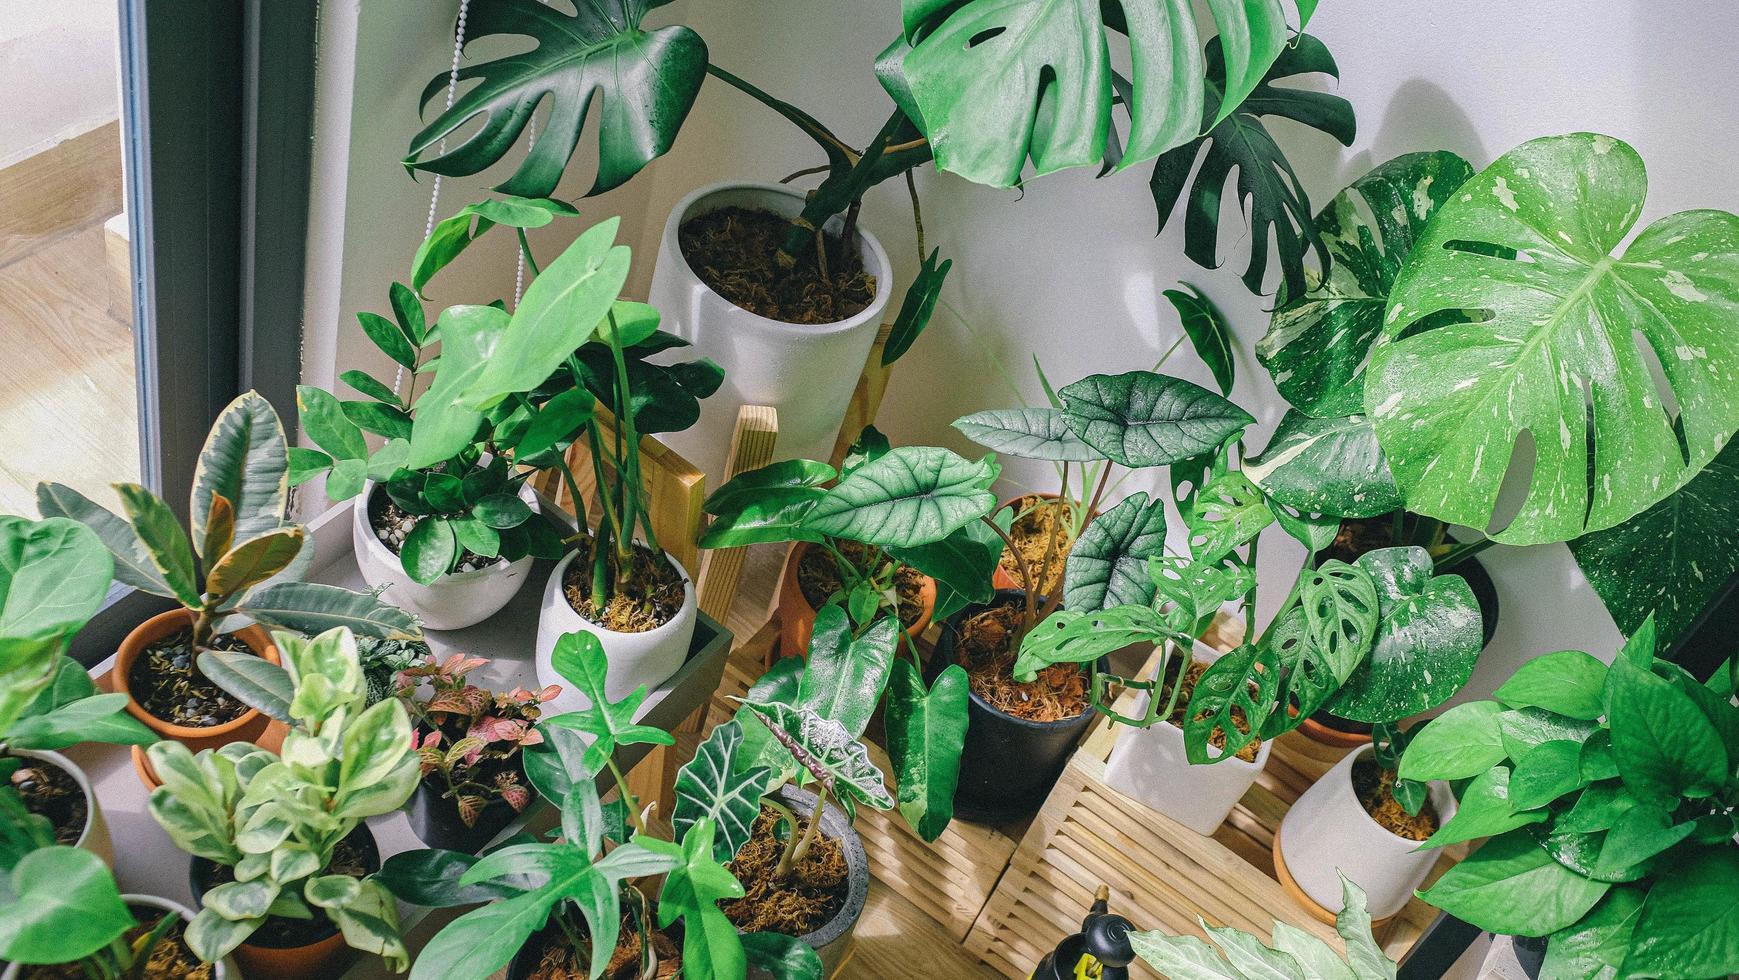 Potted plants near a window photo